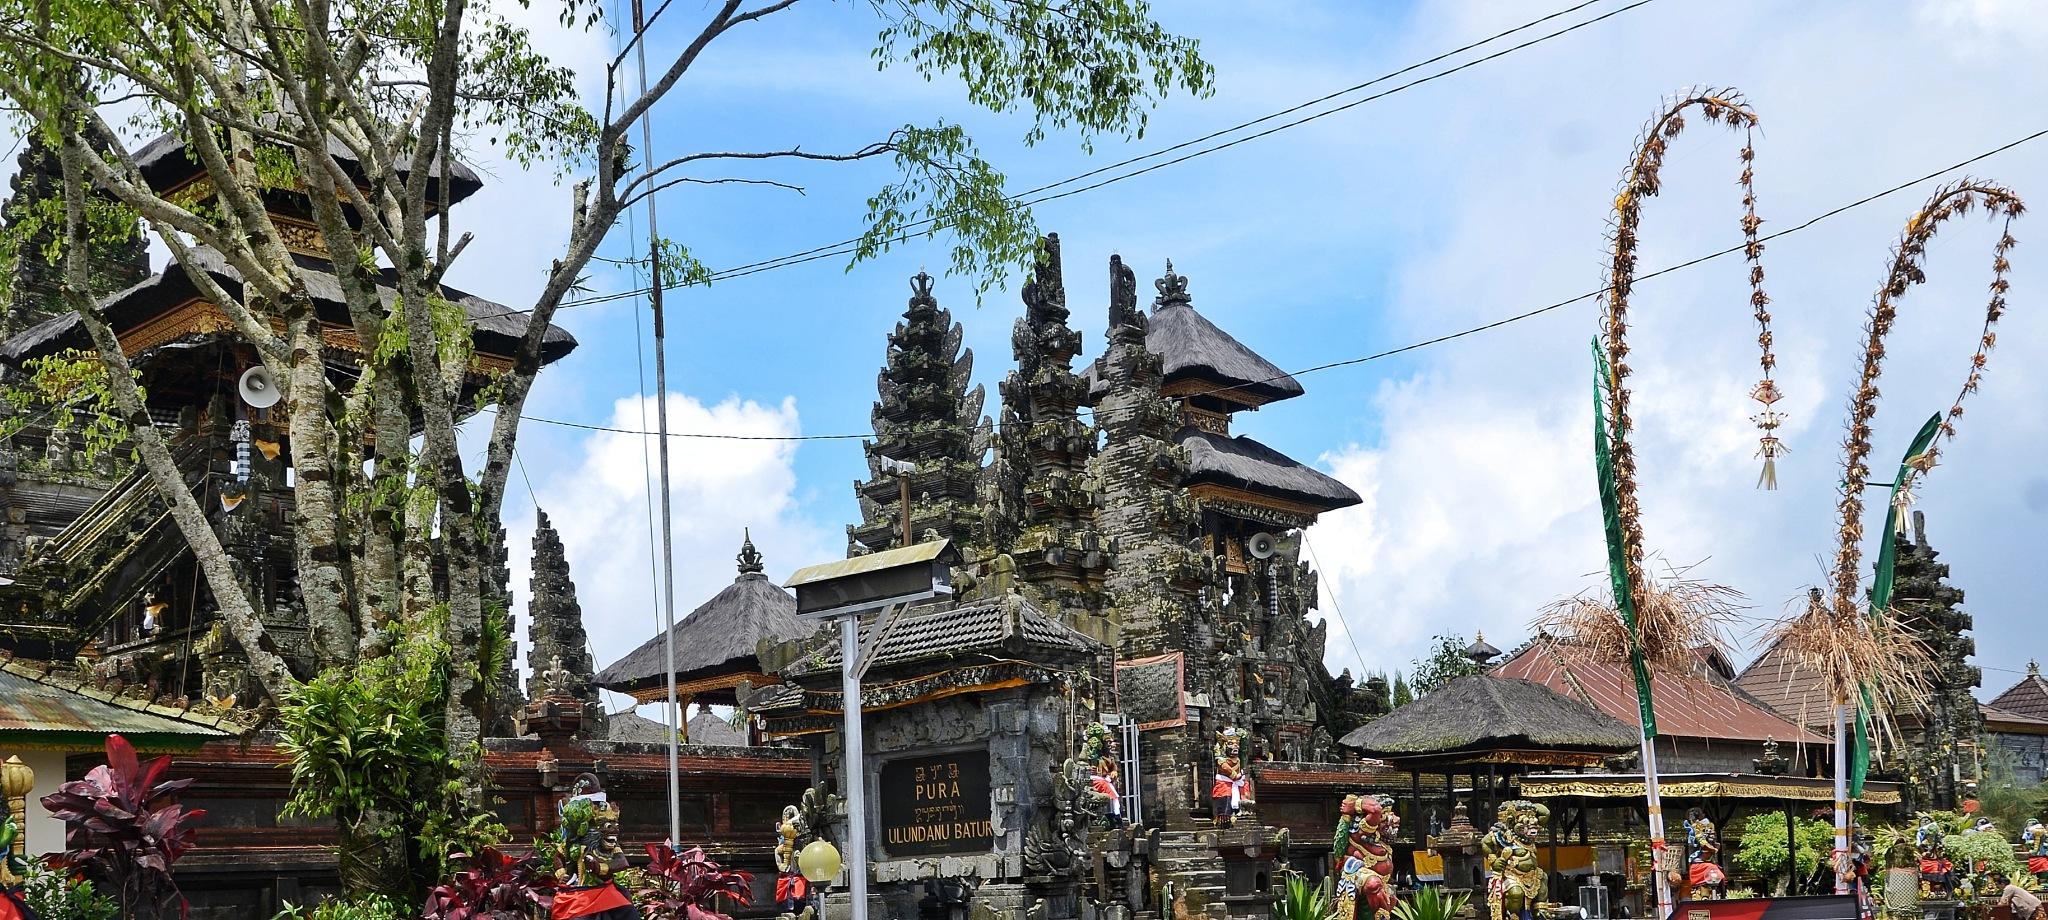 Ulundanu templez Kintamani - Bali, Indonesia by bambang irawan